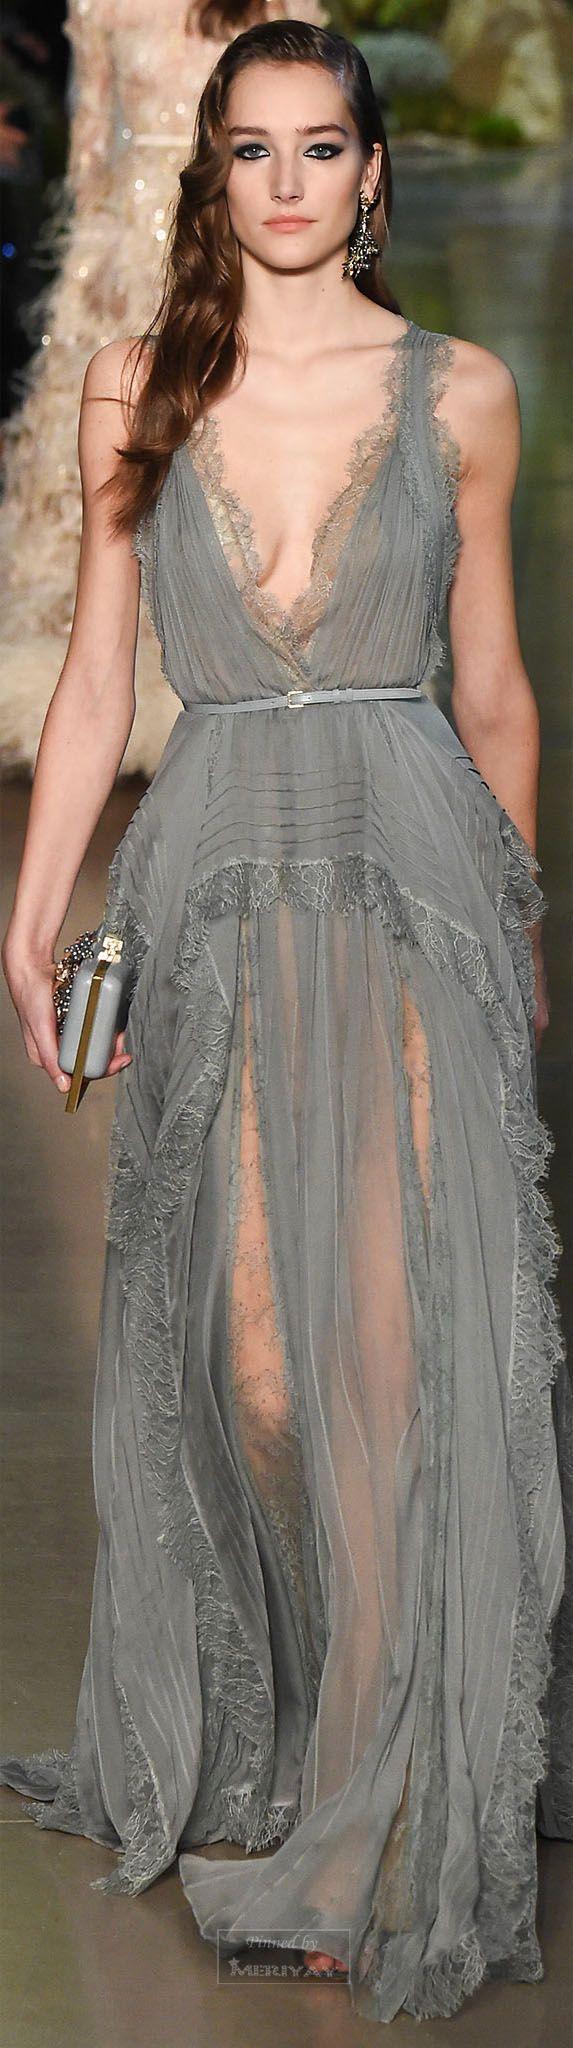 Flowy grey dress.. TD ❤️ Elie Saab.Spring 2015 Couture.